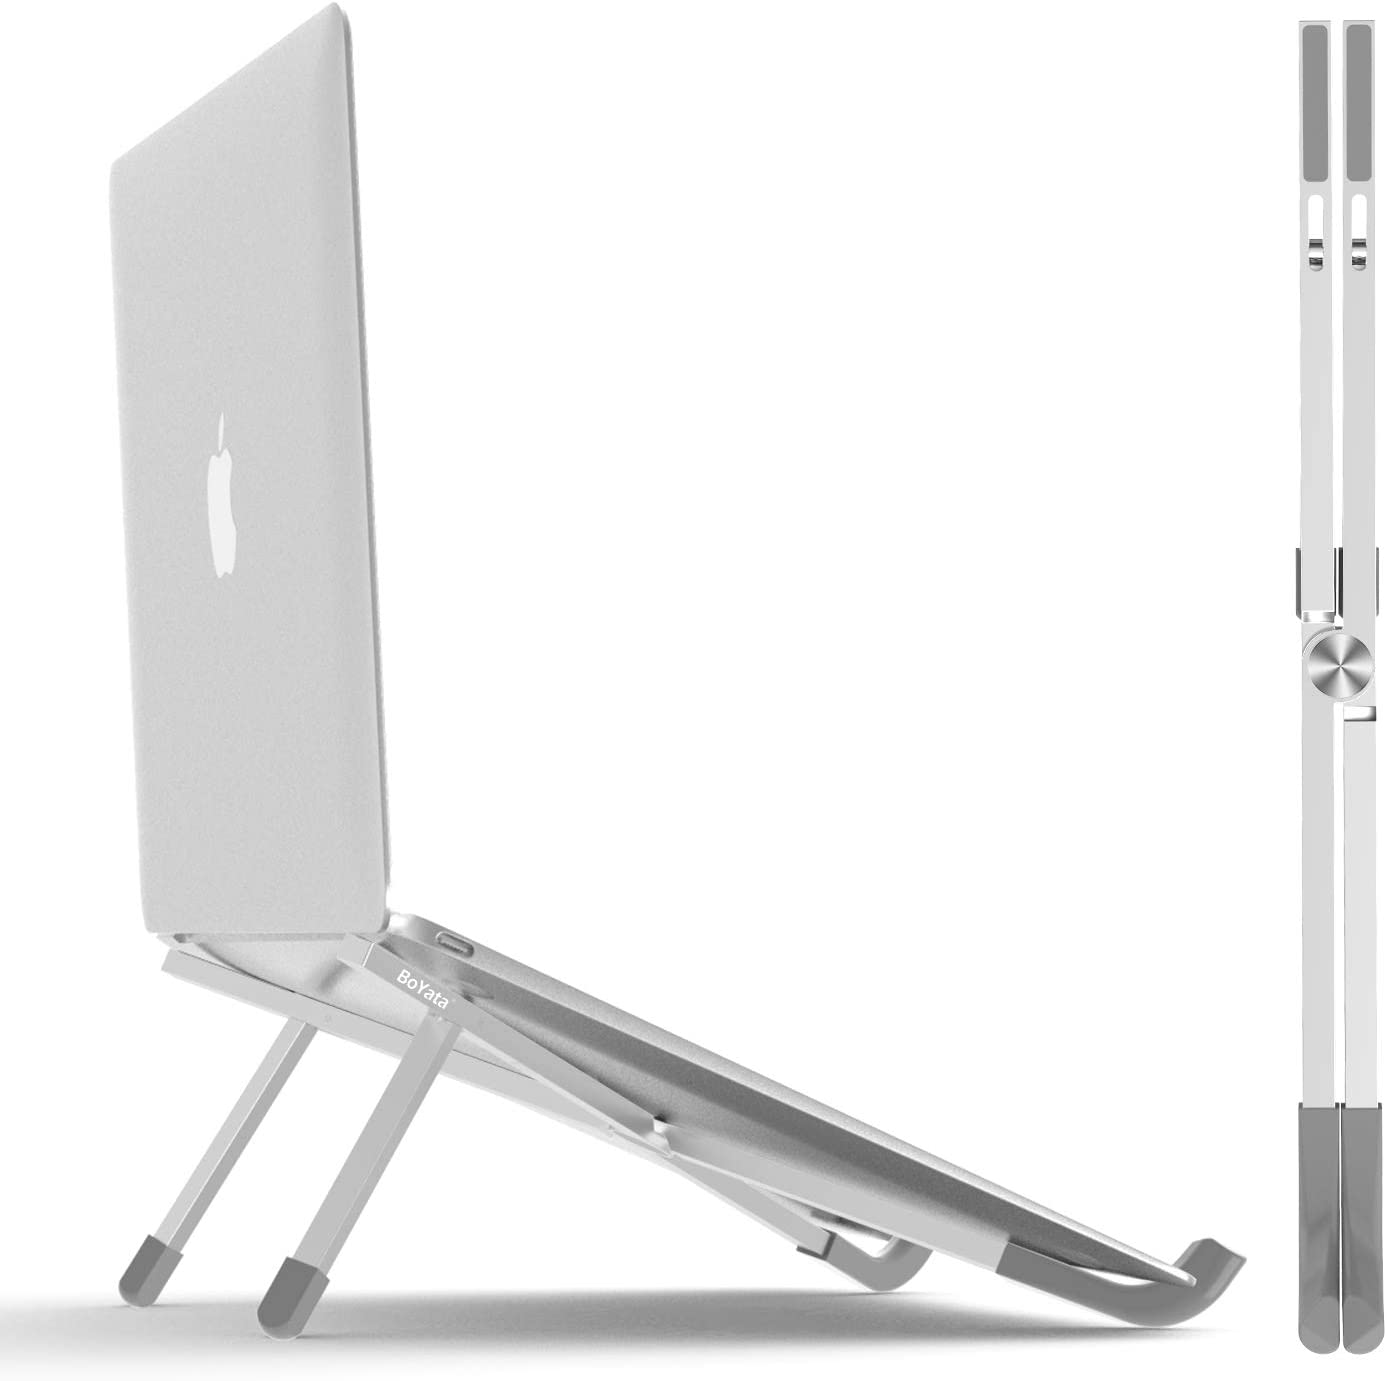 Soporte para computadora port/átil BoYata computadora port/átil y otra tableta para computadora port/átil de 11-15.6 escritorio con ventilaci/ón port/átil para MacBook Pro Air